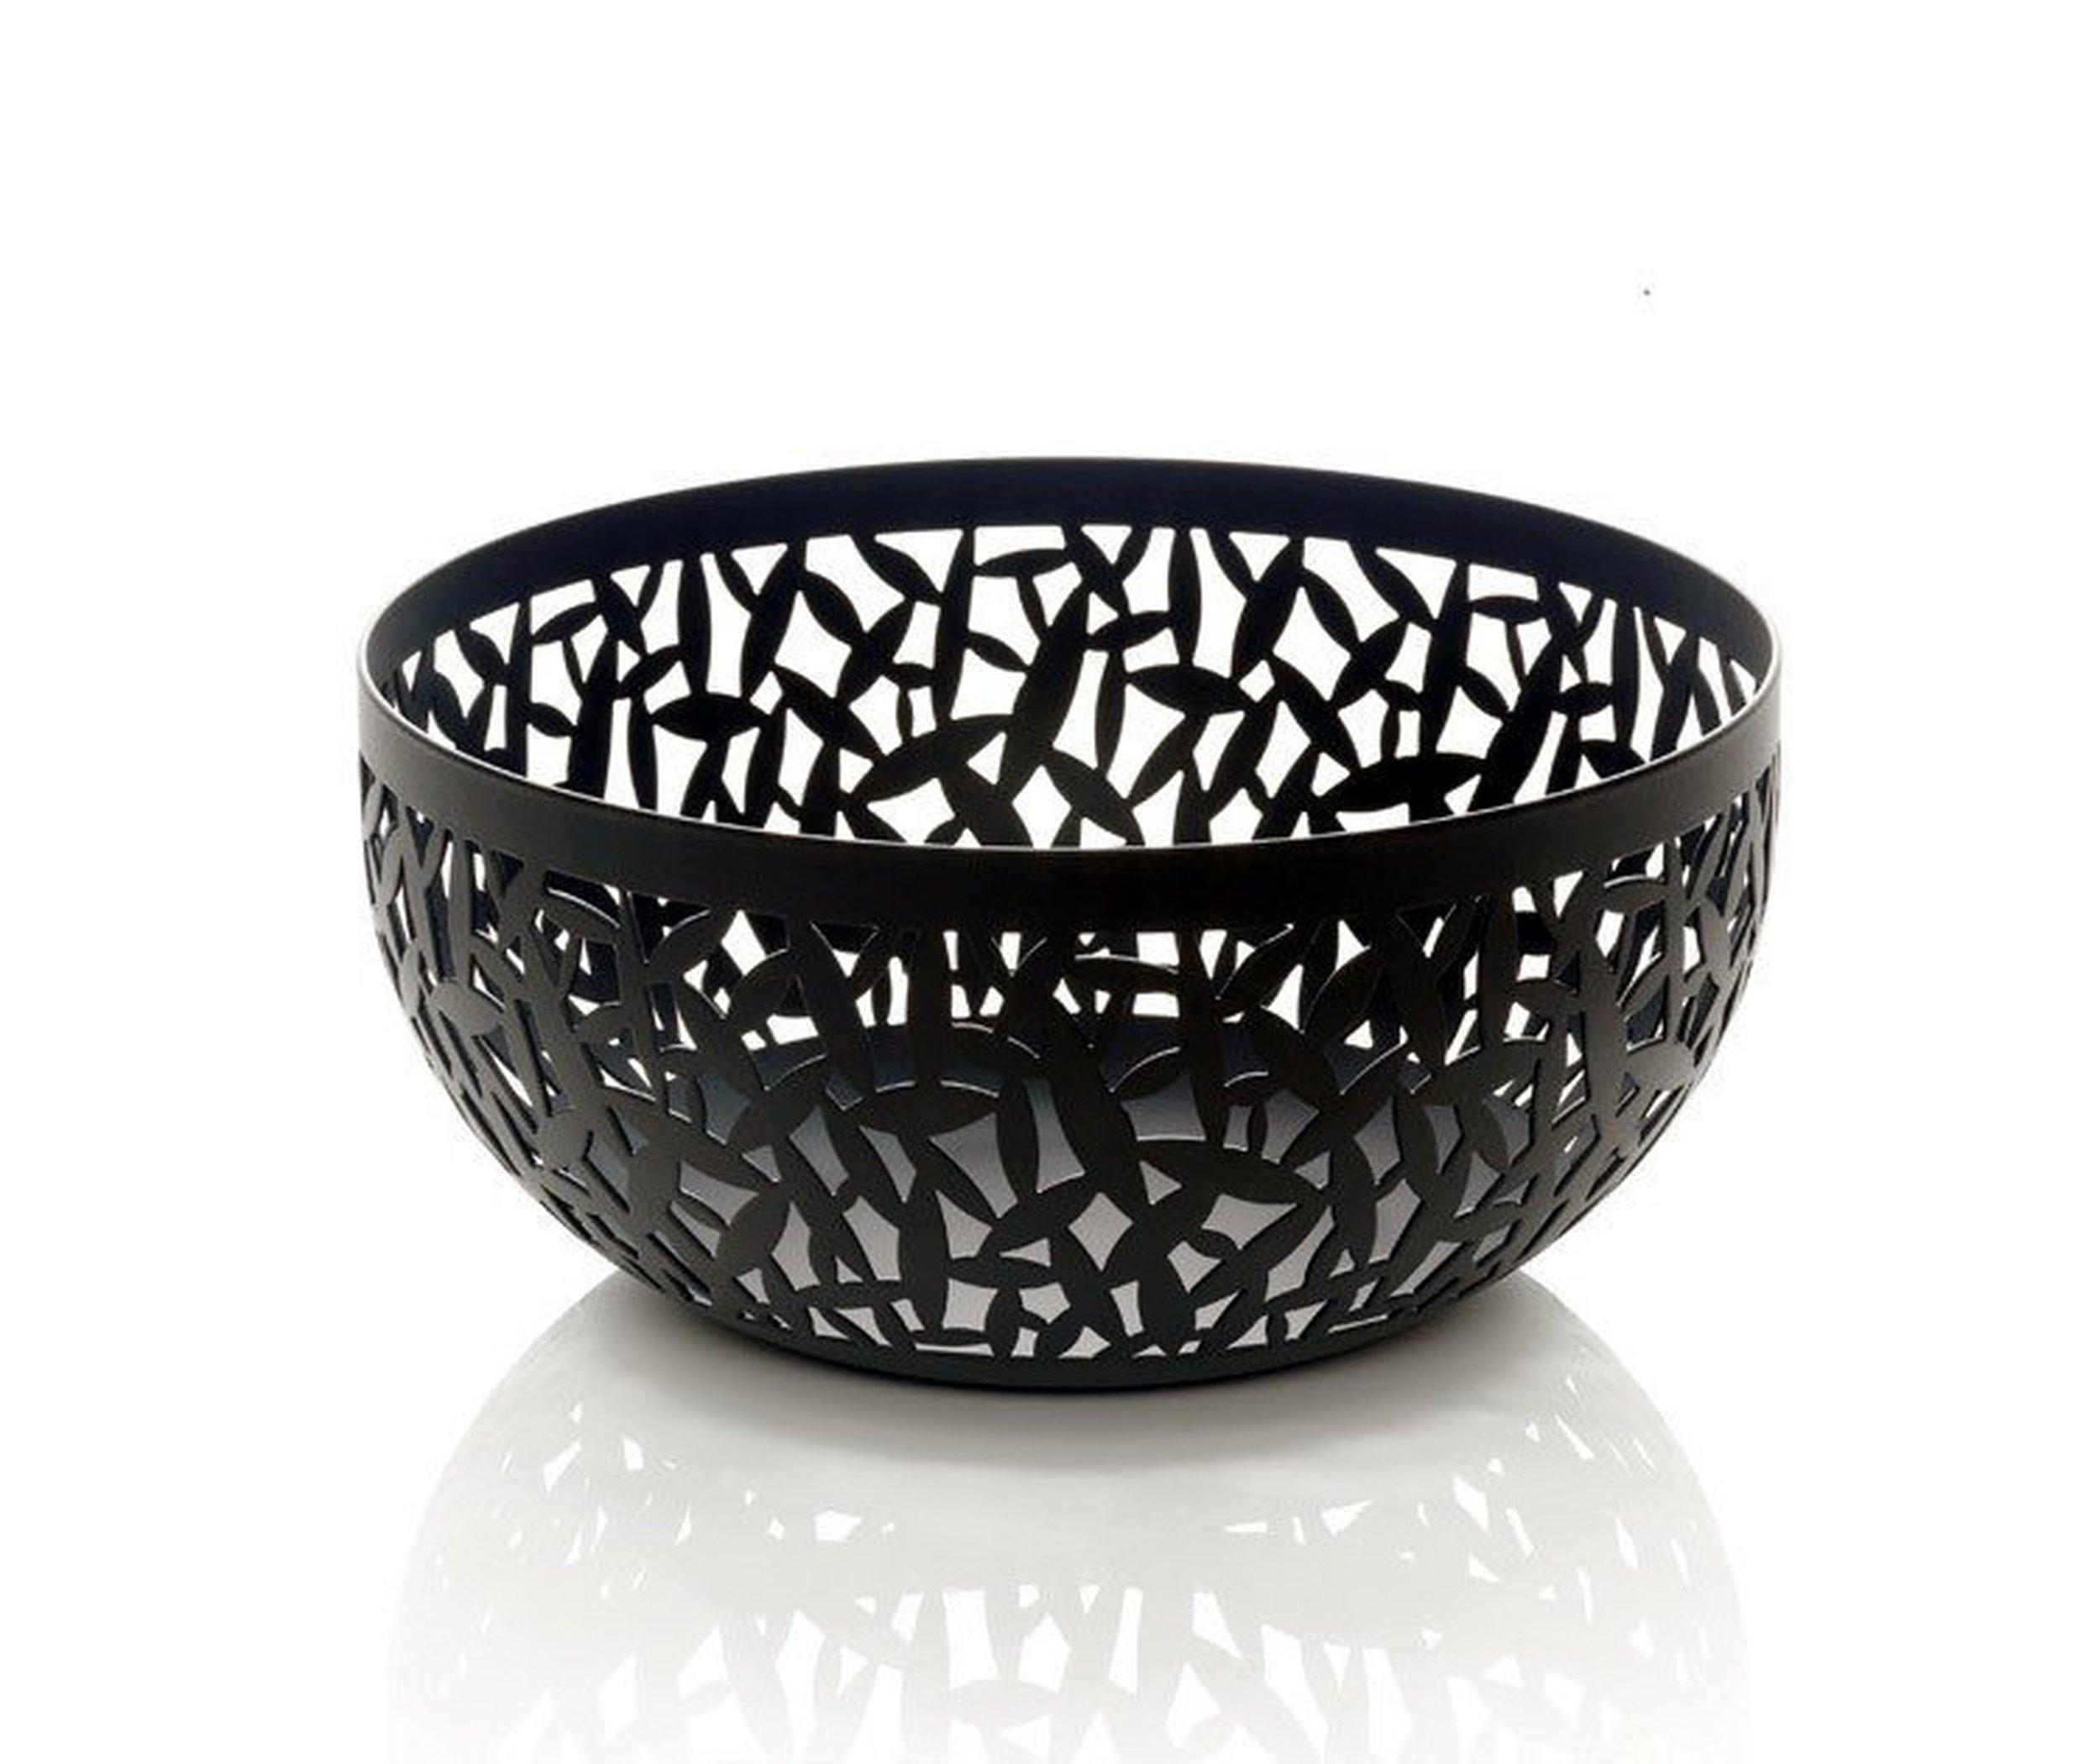 Cactus fruit bowl alessi - Alessi fruit bowl ...